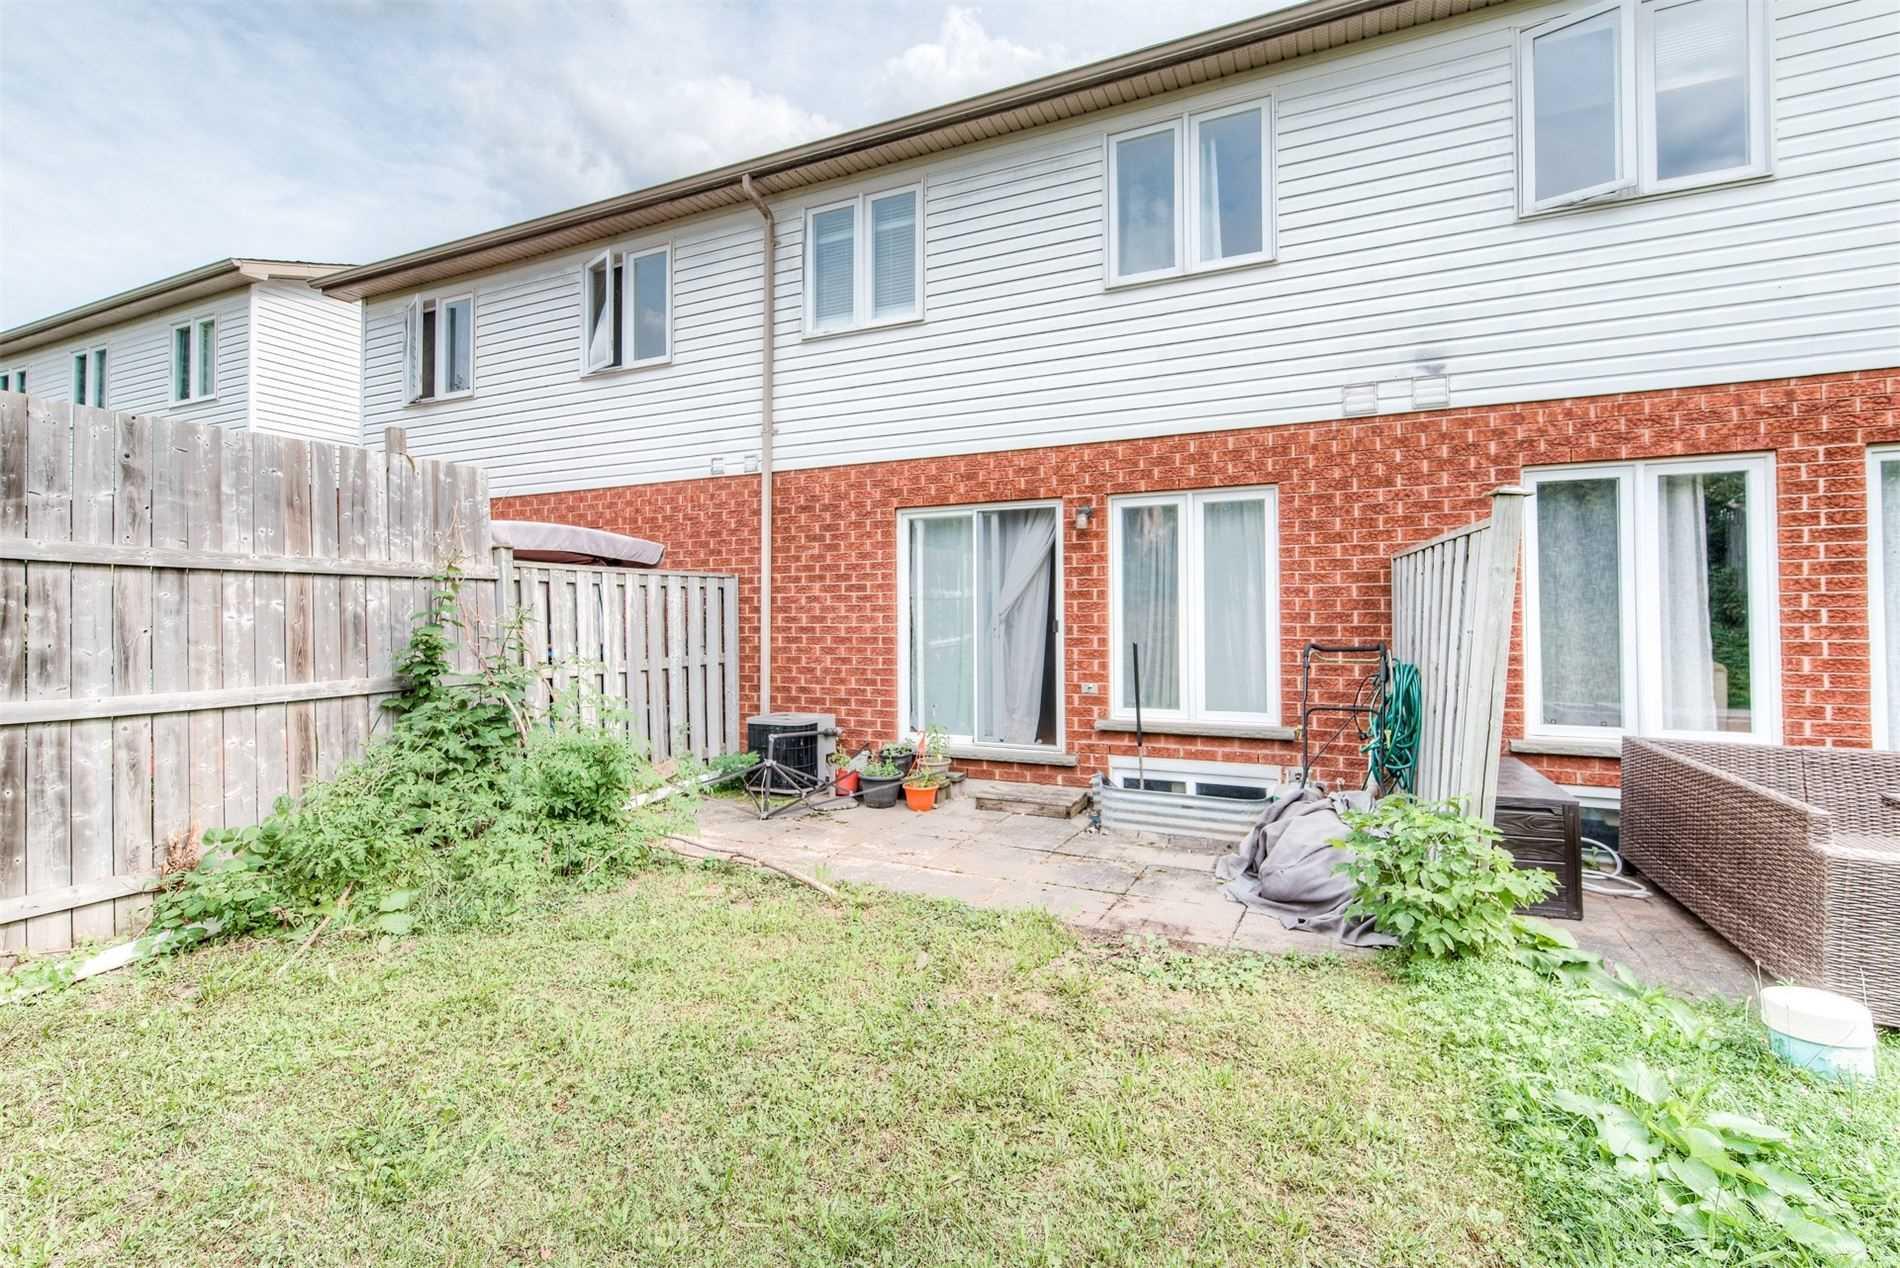 Condo Townhouse For Sale In Kitchener , 3 Bedrooms Bedrooms, ,2 BathroomsBathrooms,Condo Townhouse,For Sale,18,Heiman